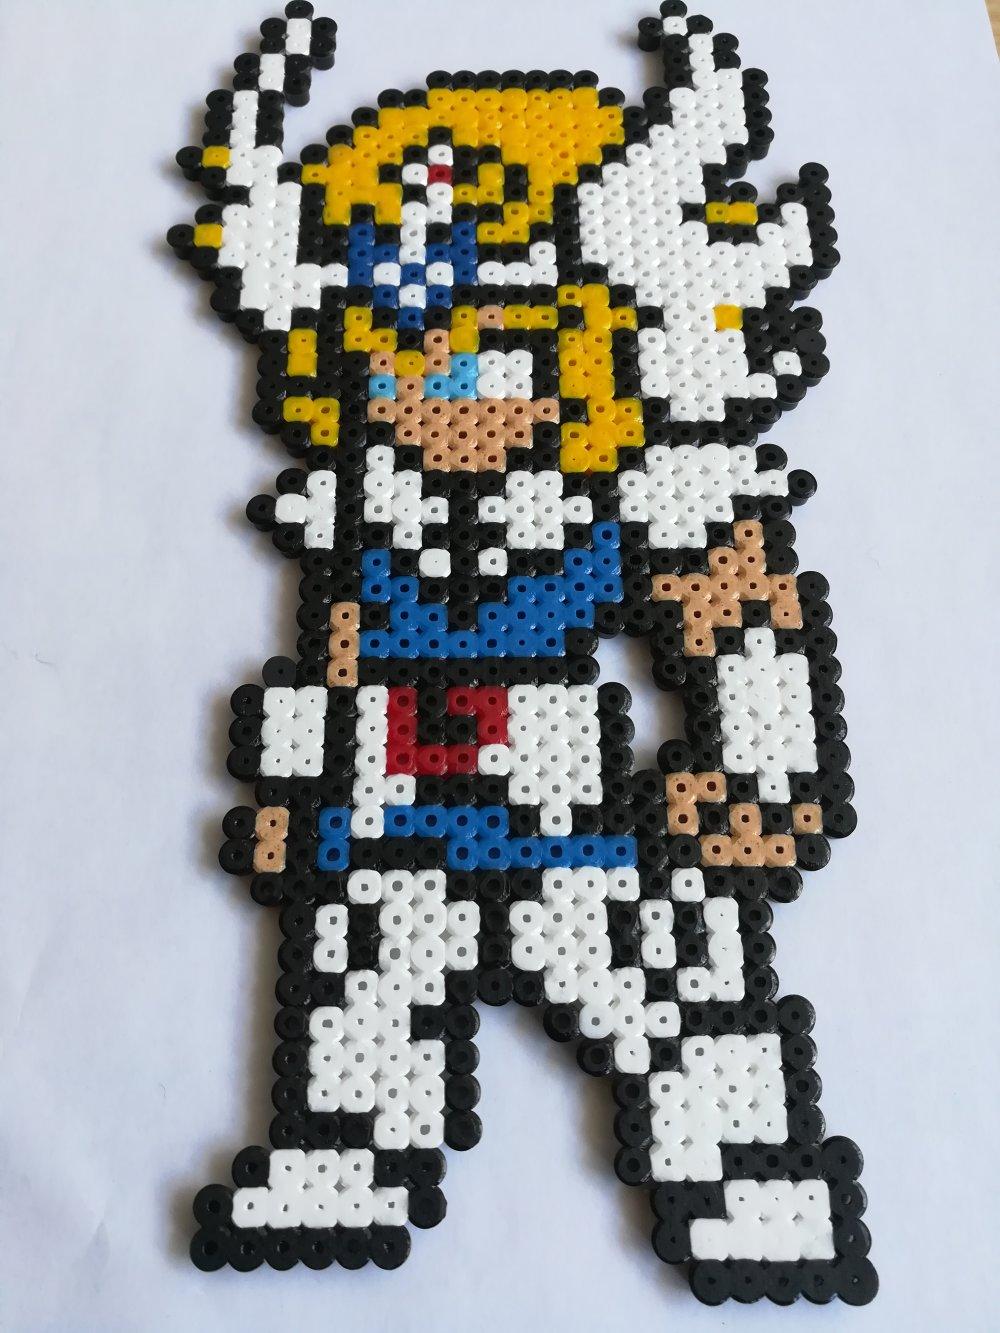 HYOGA Chevalier du Cygne - Chevaliers du Zodiaque - perles à repasser HAMA - Pixel Art - Geek Art